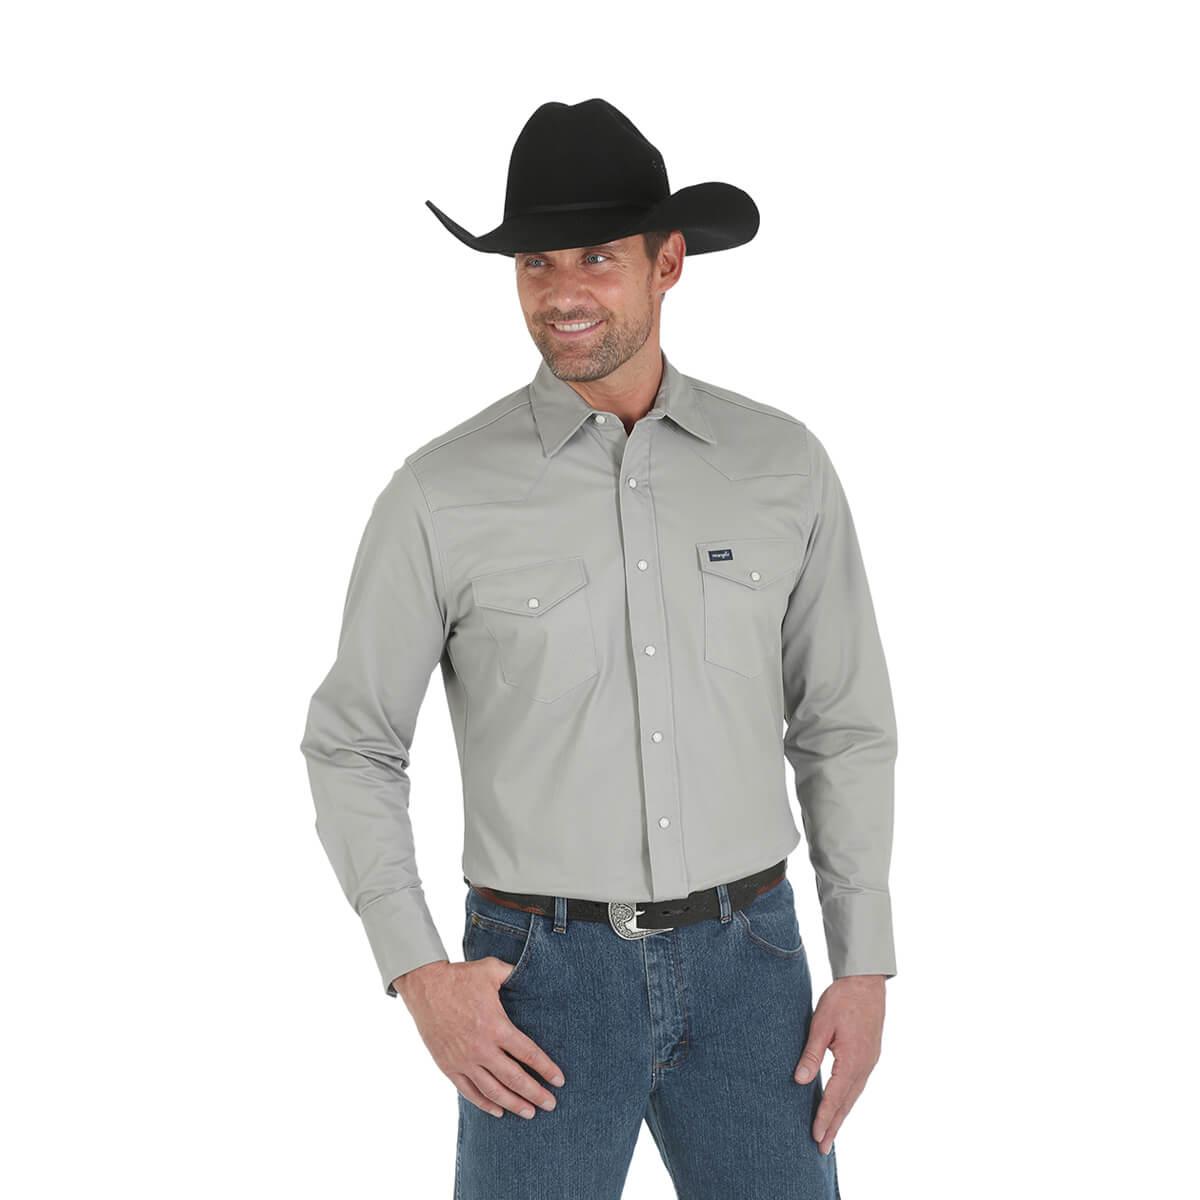 Men's Wrangler® Premium Performance Advanced Comfort Cowboy-Cut Long-Sleeved Shirt - Cement